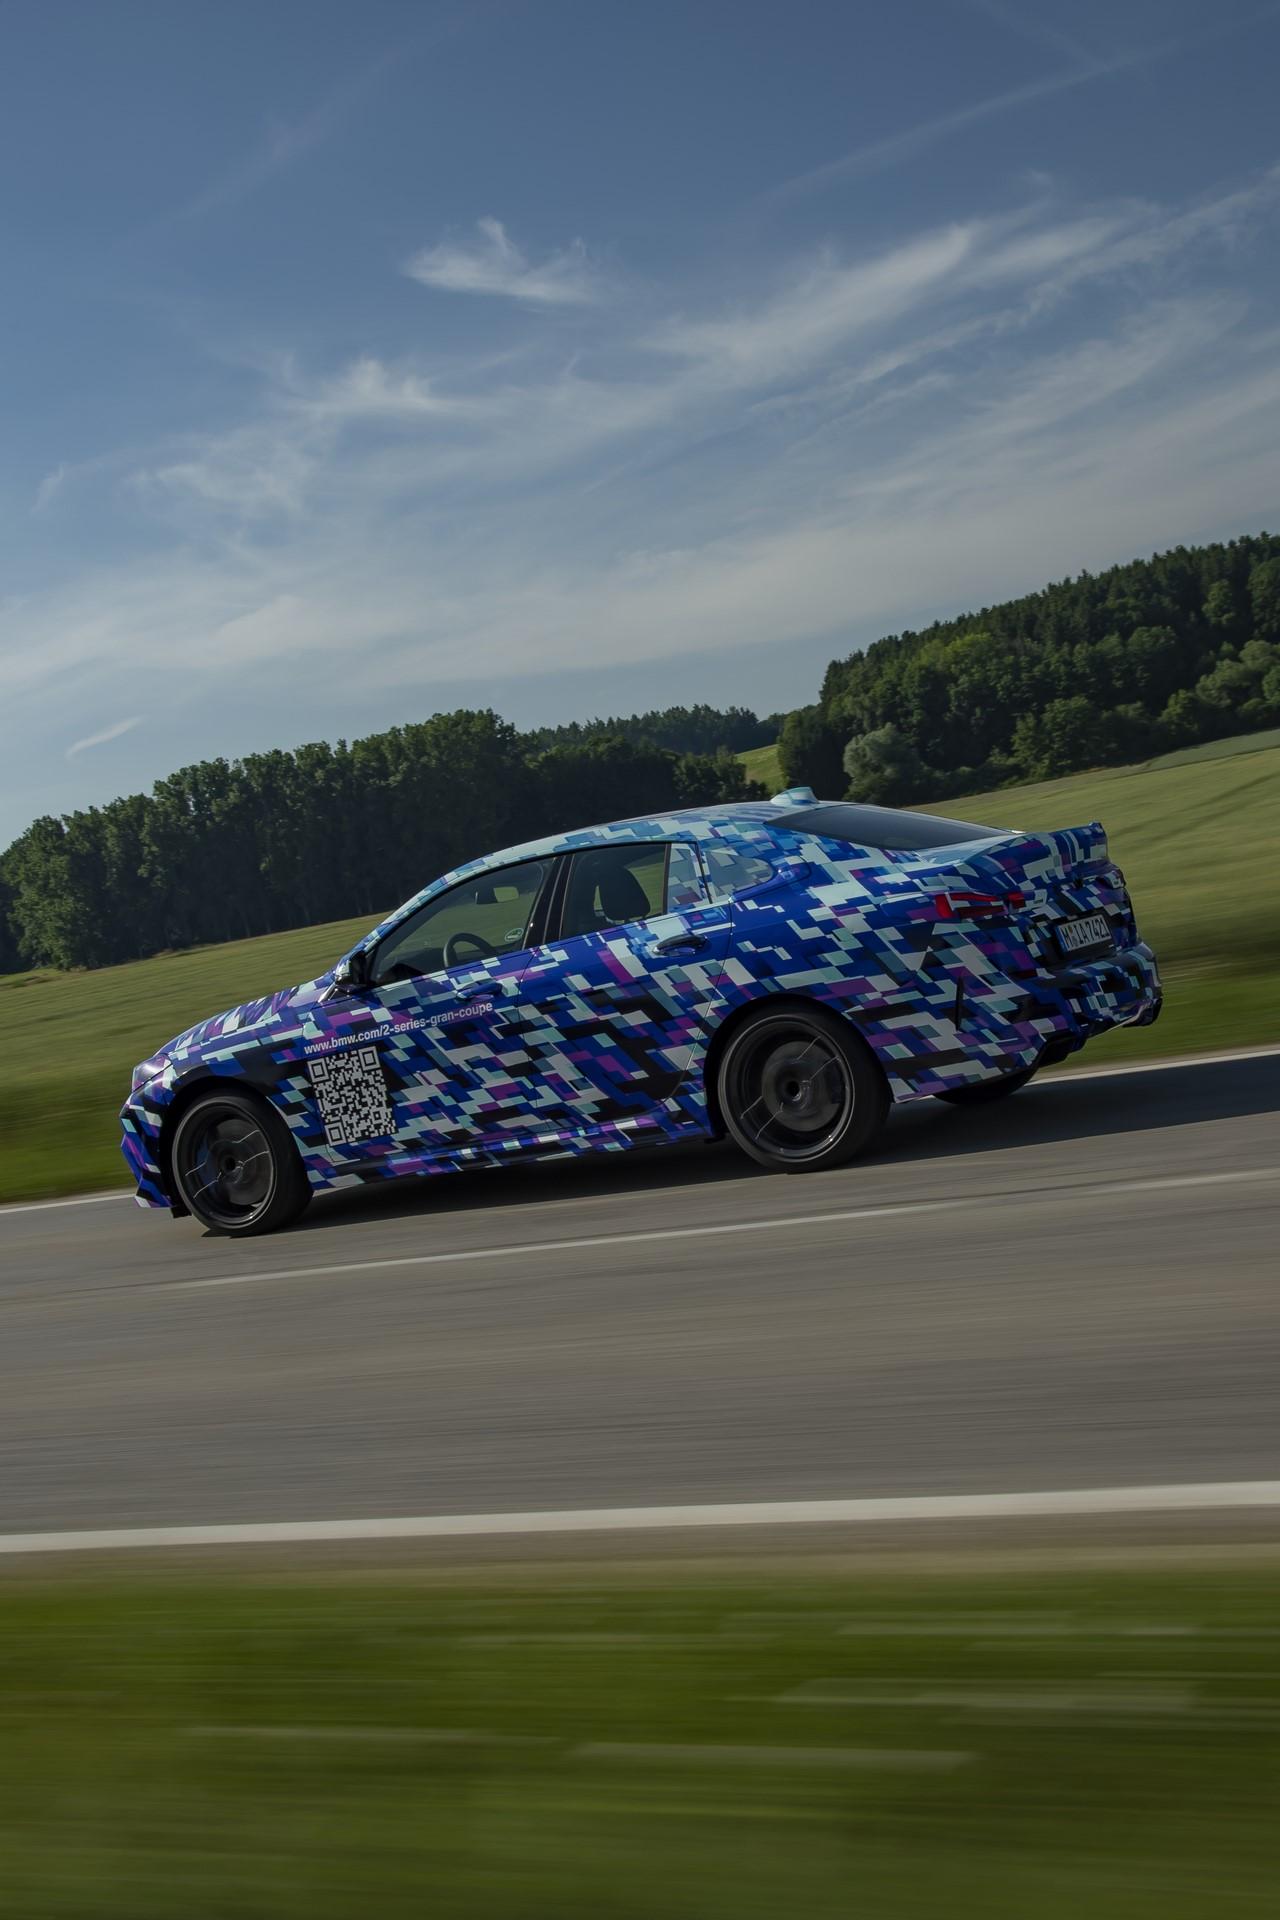 BMW-2-Series-Gran-Coupe-2020-spy-photos-31